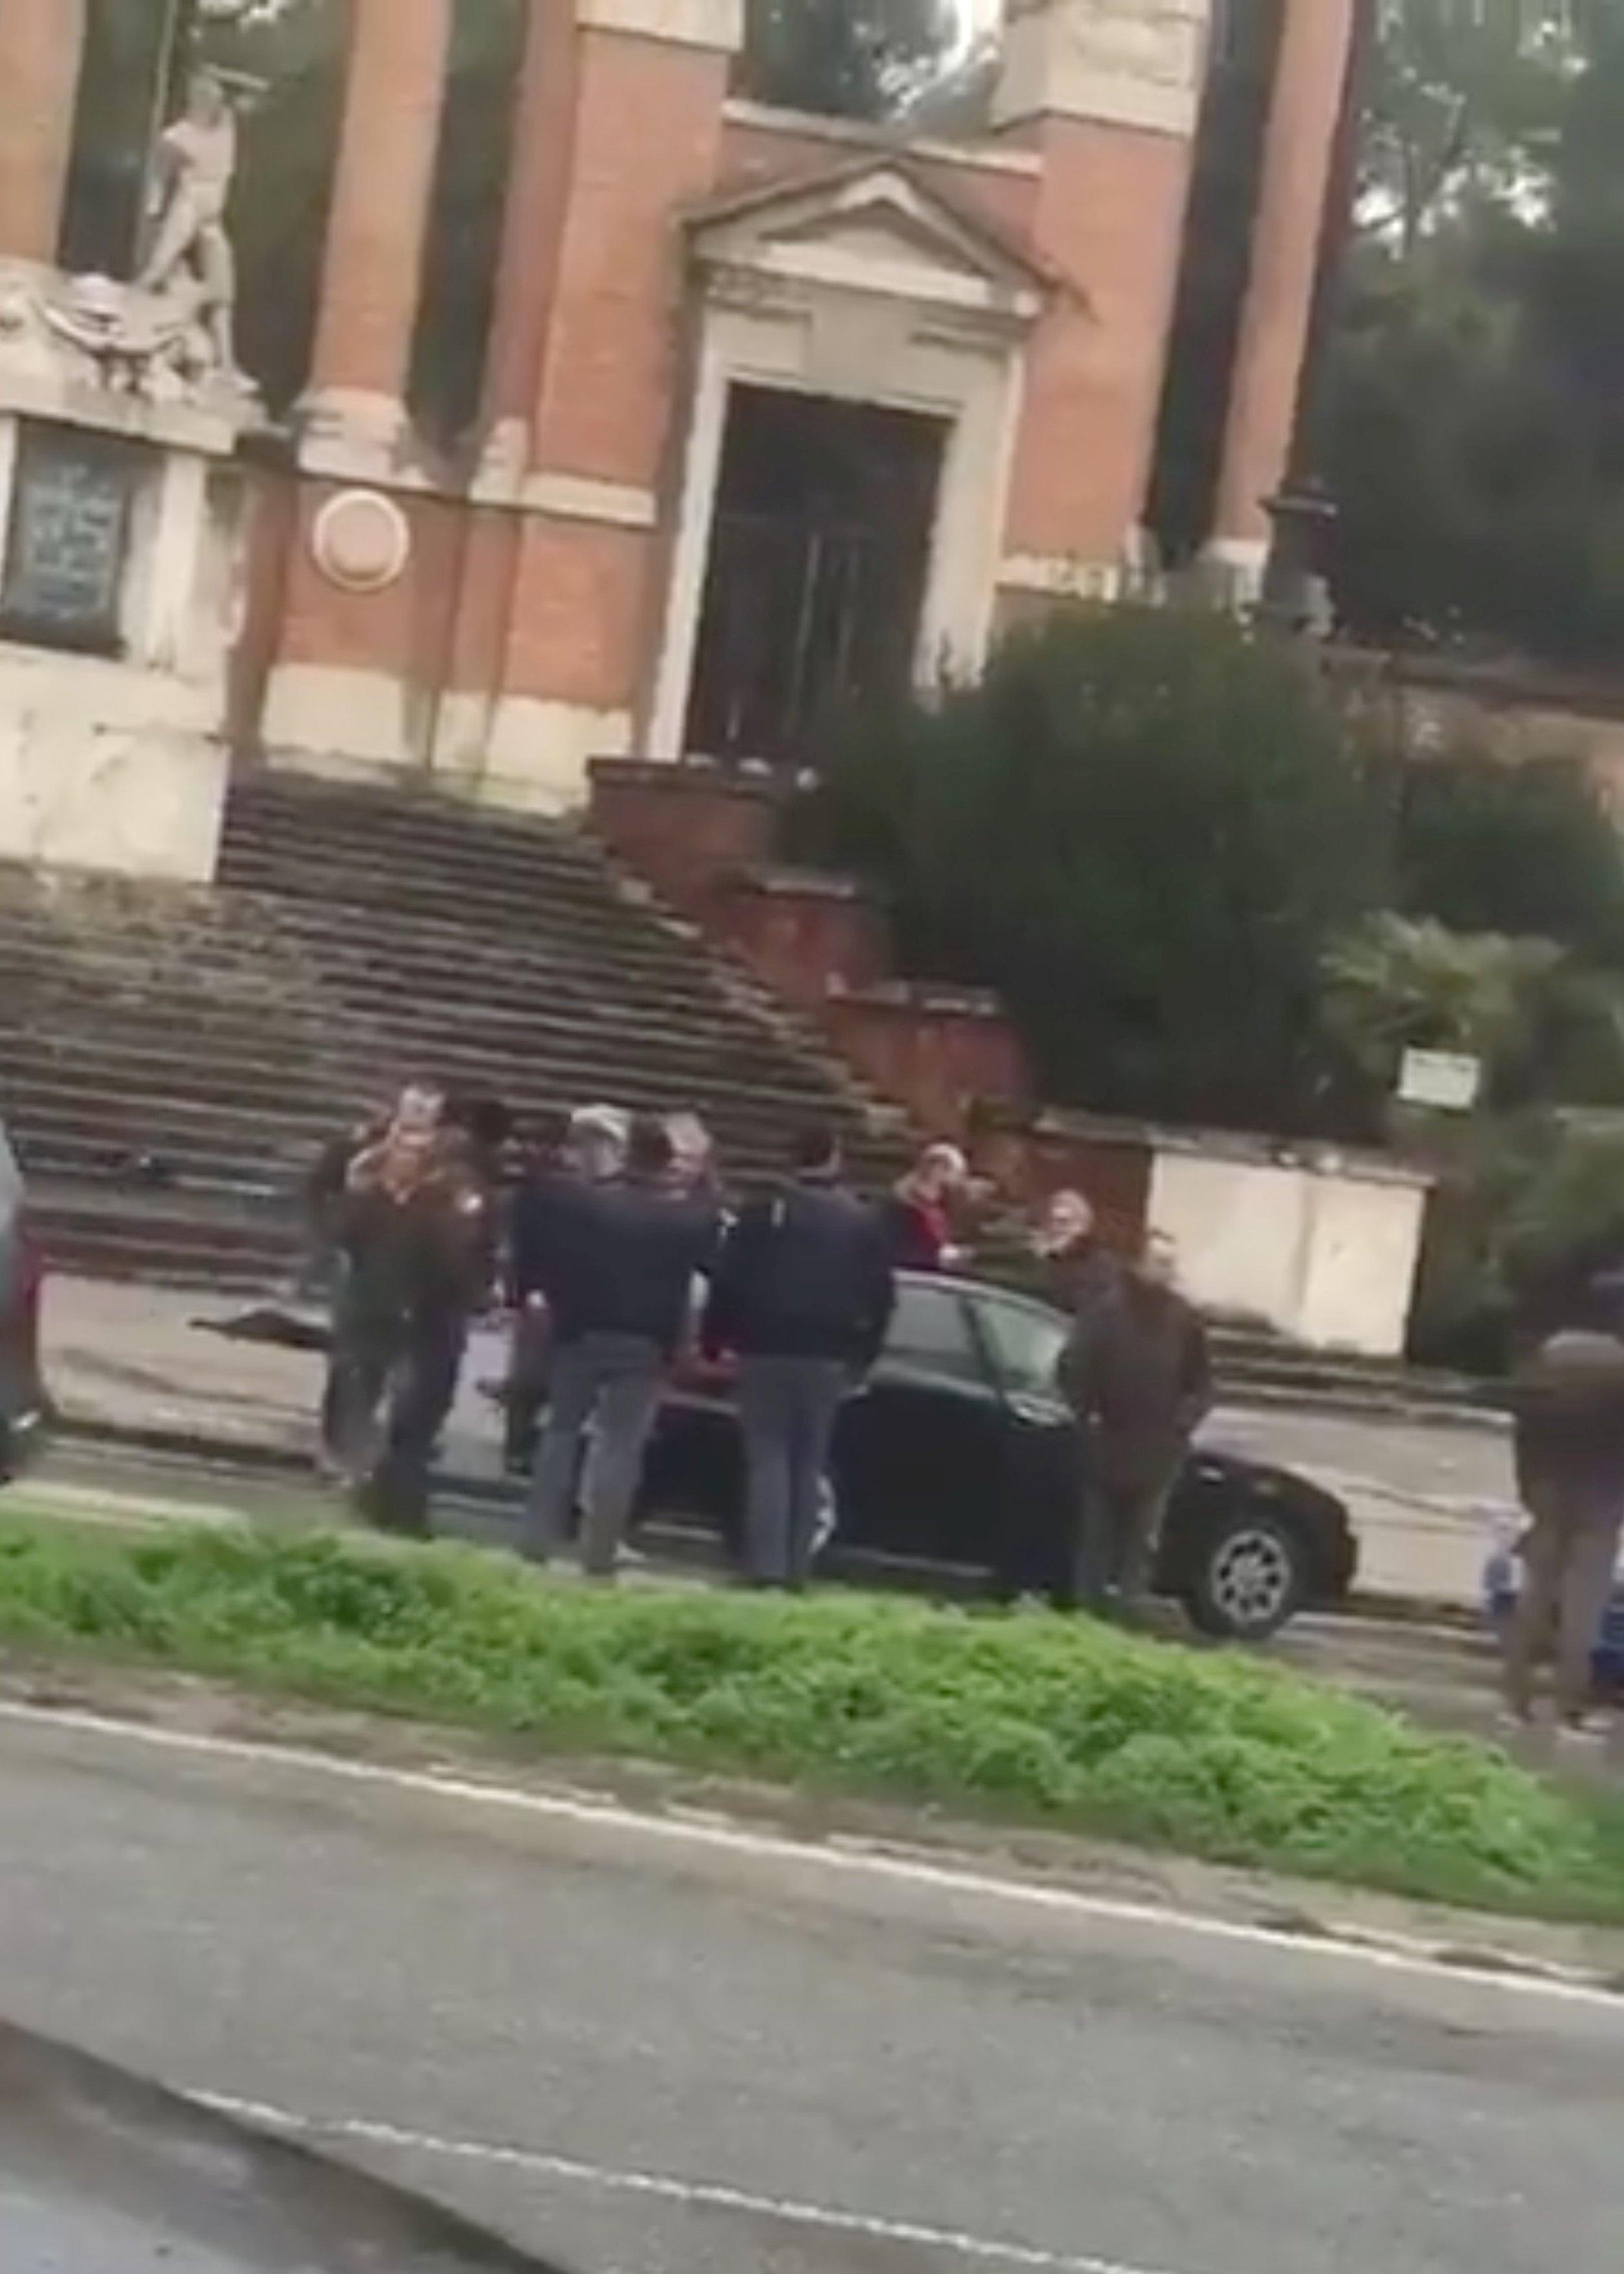 2018-02-03T132049Z_1_LYNXMPEE1206H_RTROPTP_4_ITALY-SHOOTING-MACERATA